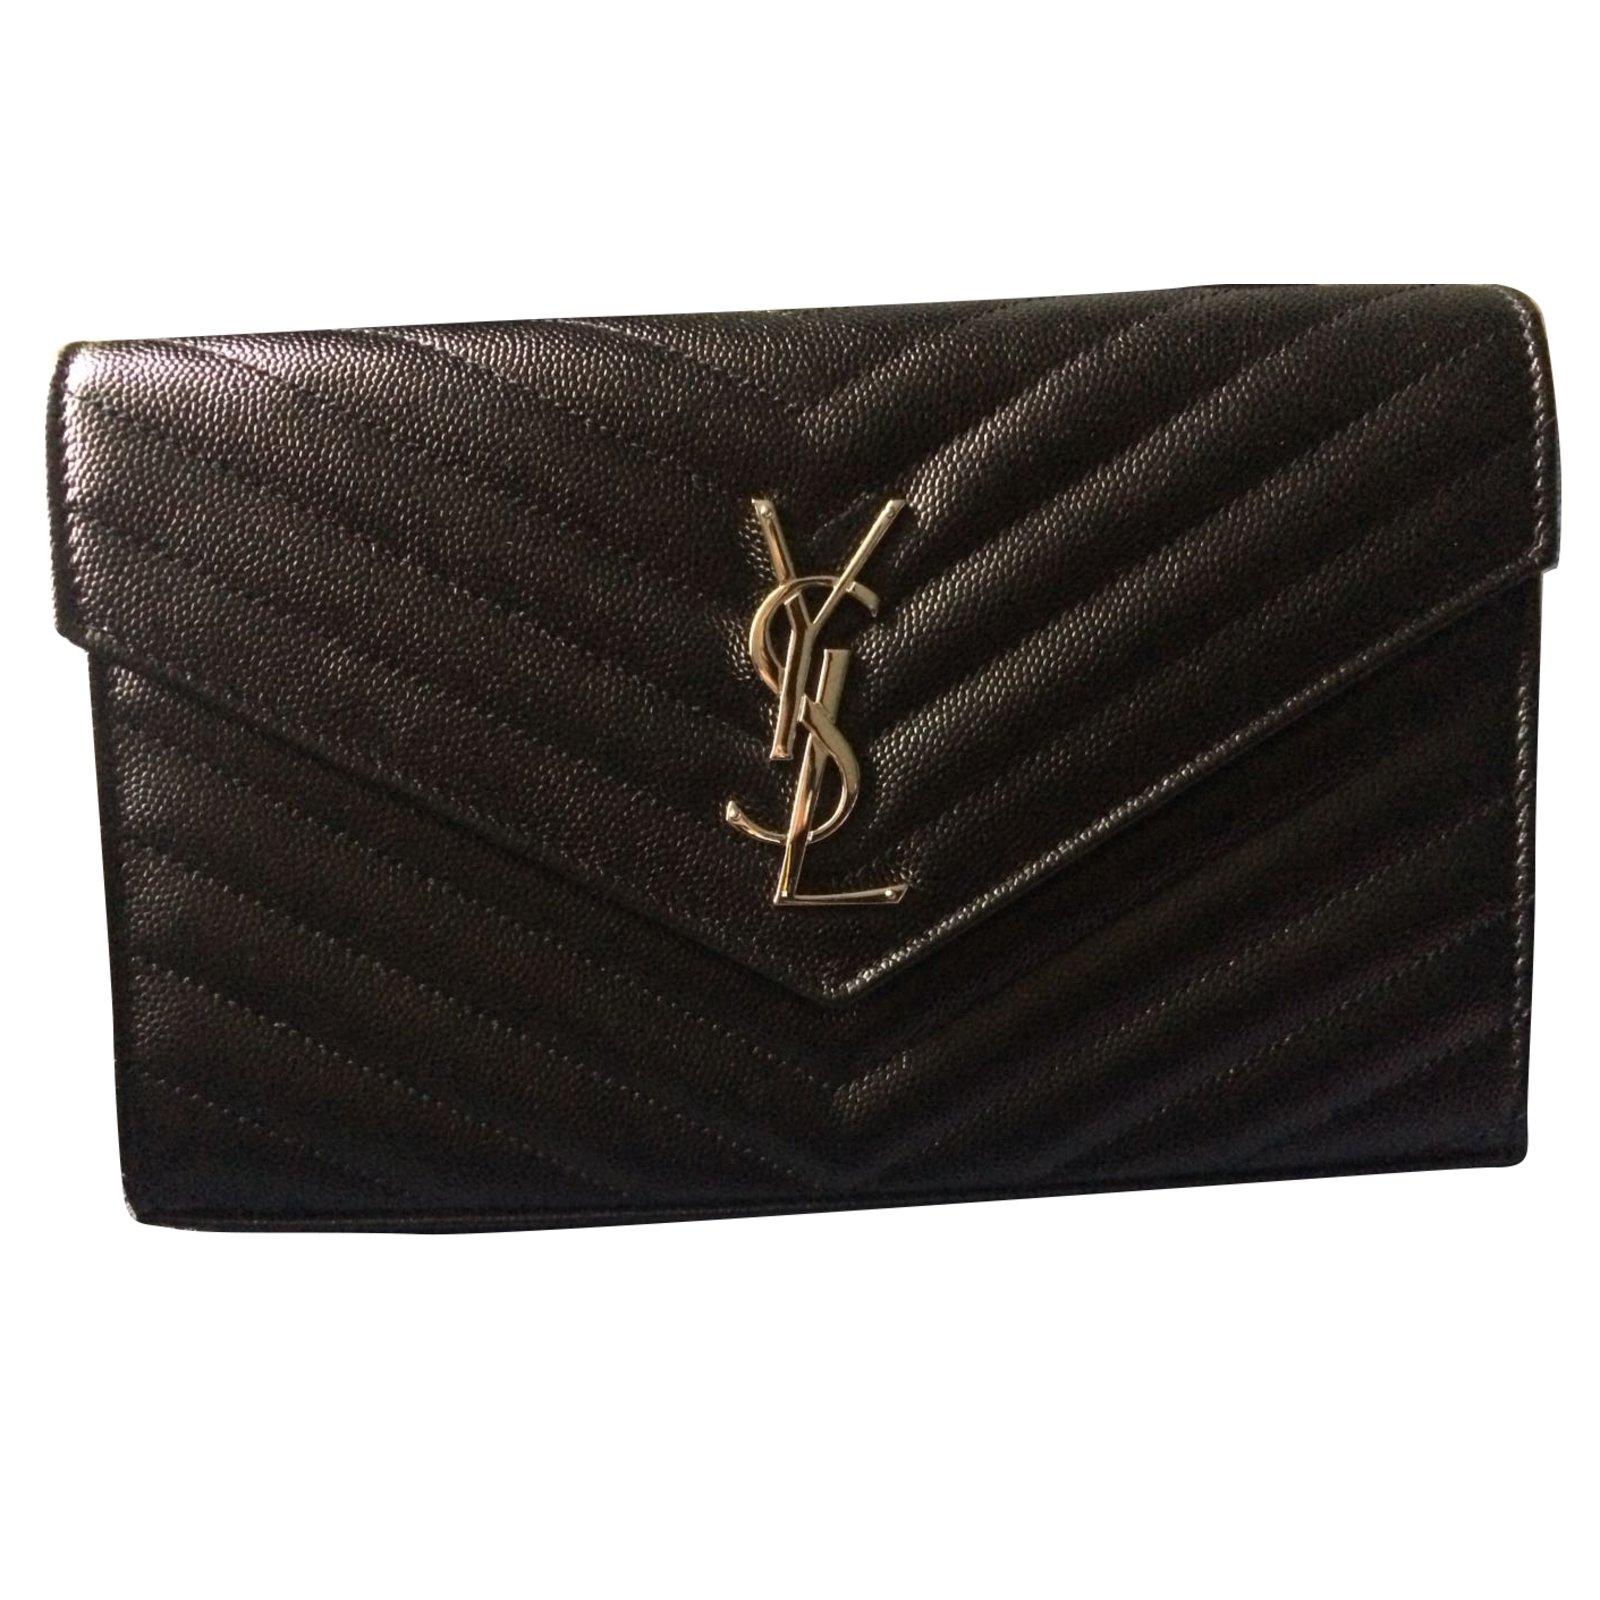 f49ce83d9b9 Yves Saint Laurent Clutch bags Clutch bags Leather Black ref.64718 ...